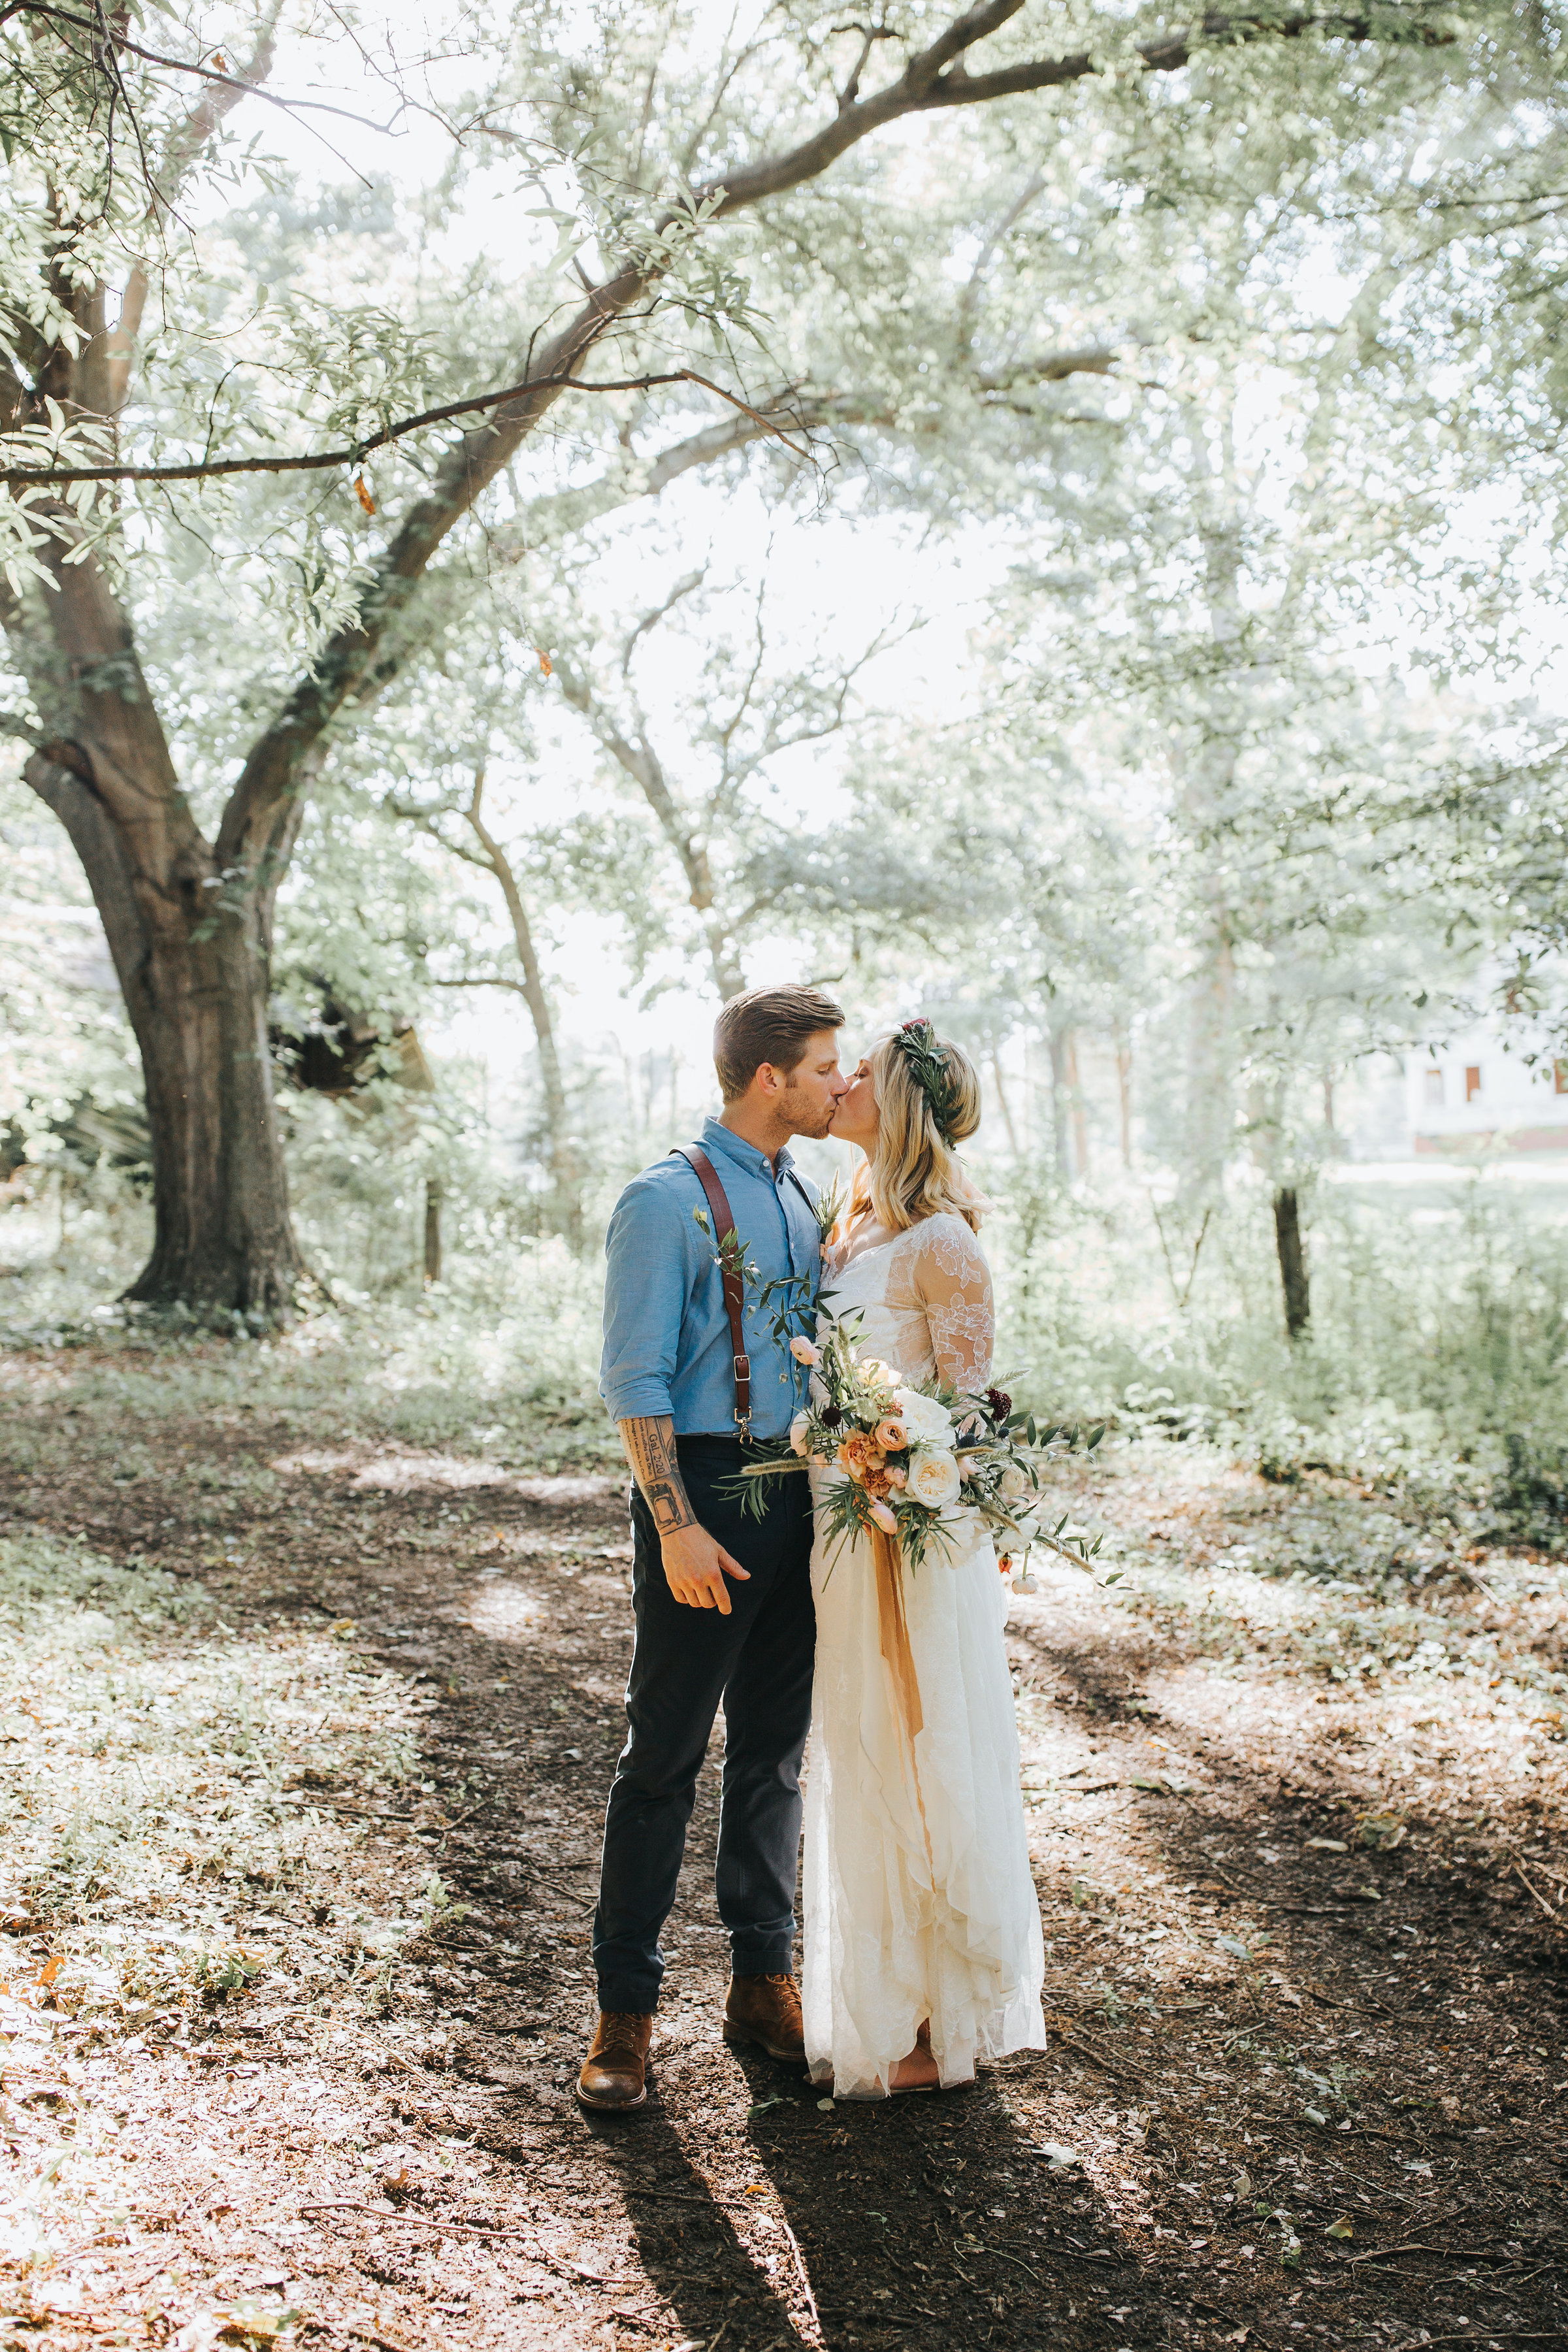 SethandKate_Wedding_MSP_HighRes(865of1195).jpg